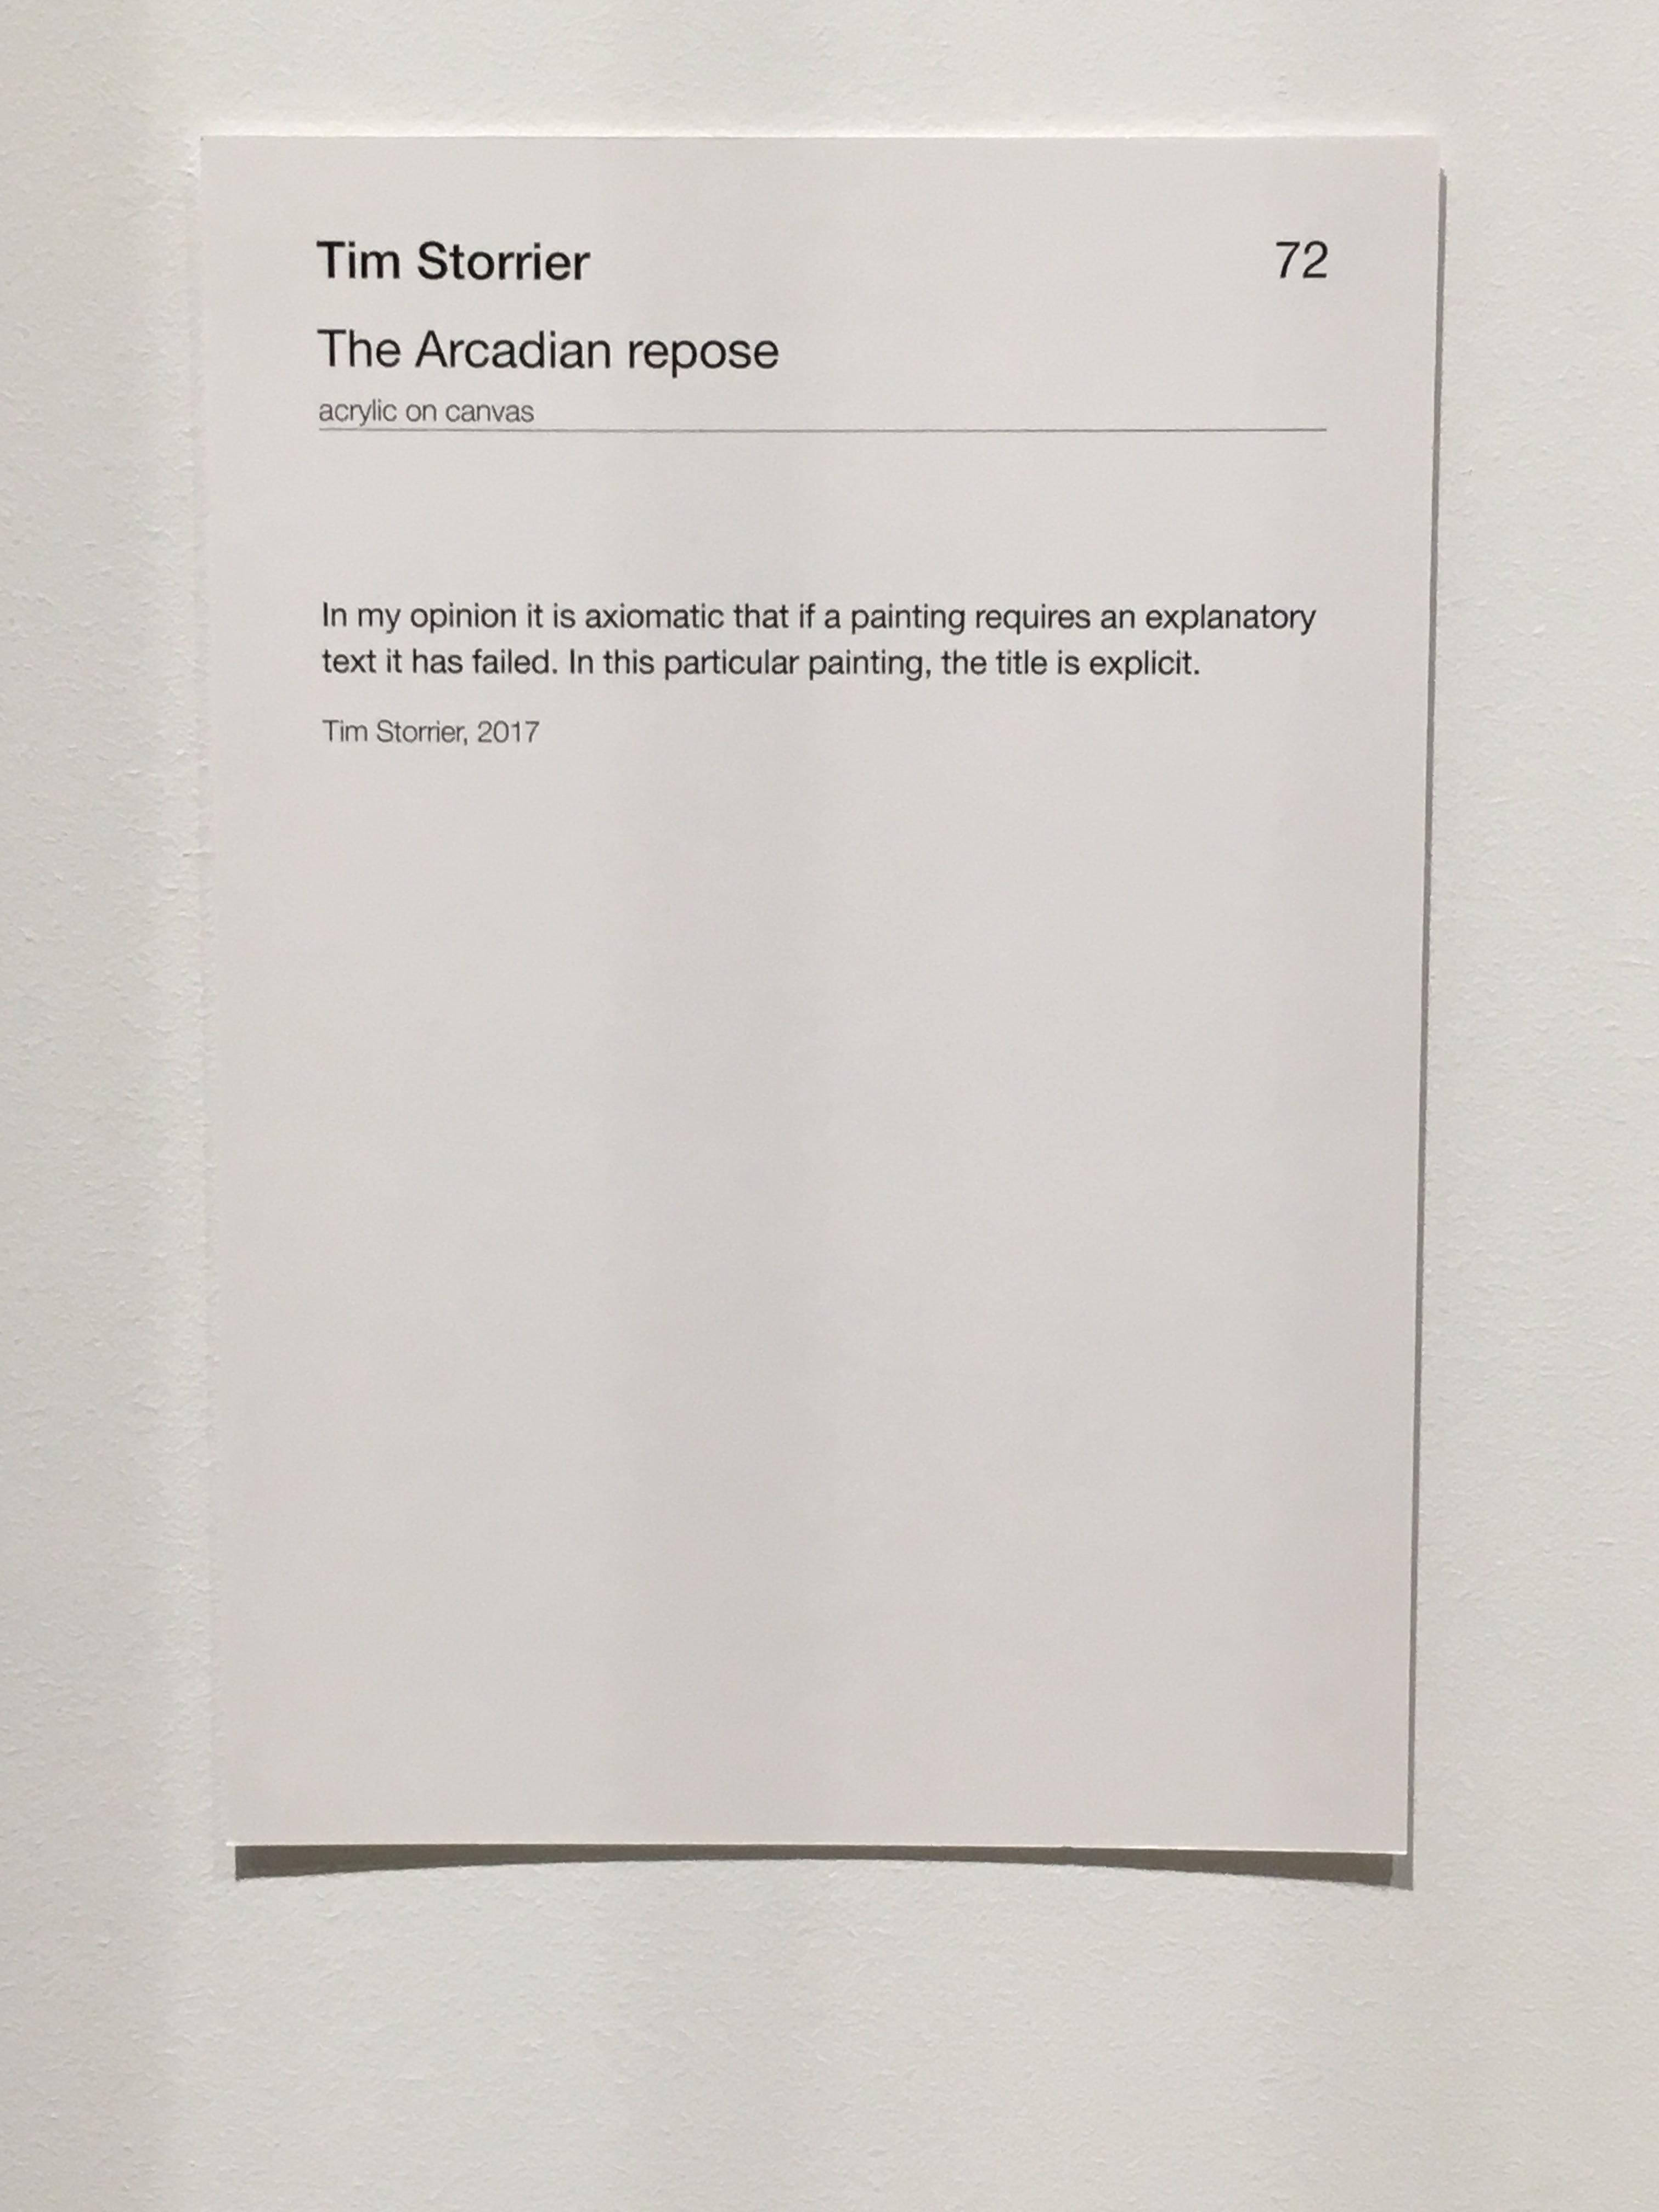 Insightful Label In An Art Gallery Art Gallery Labels Gallery